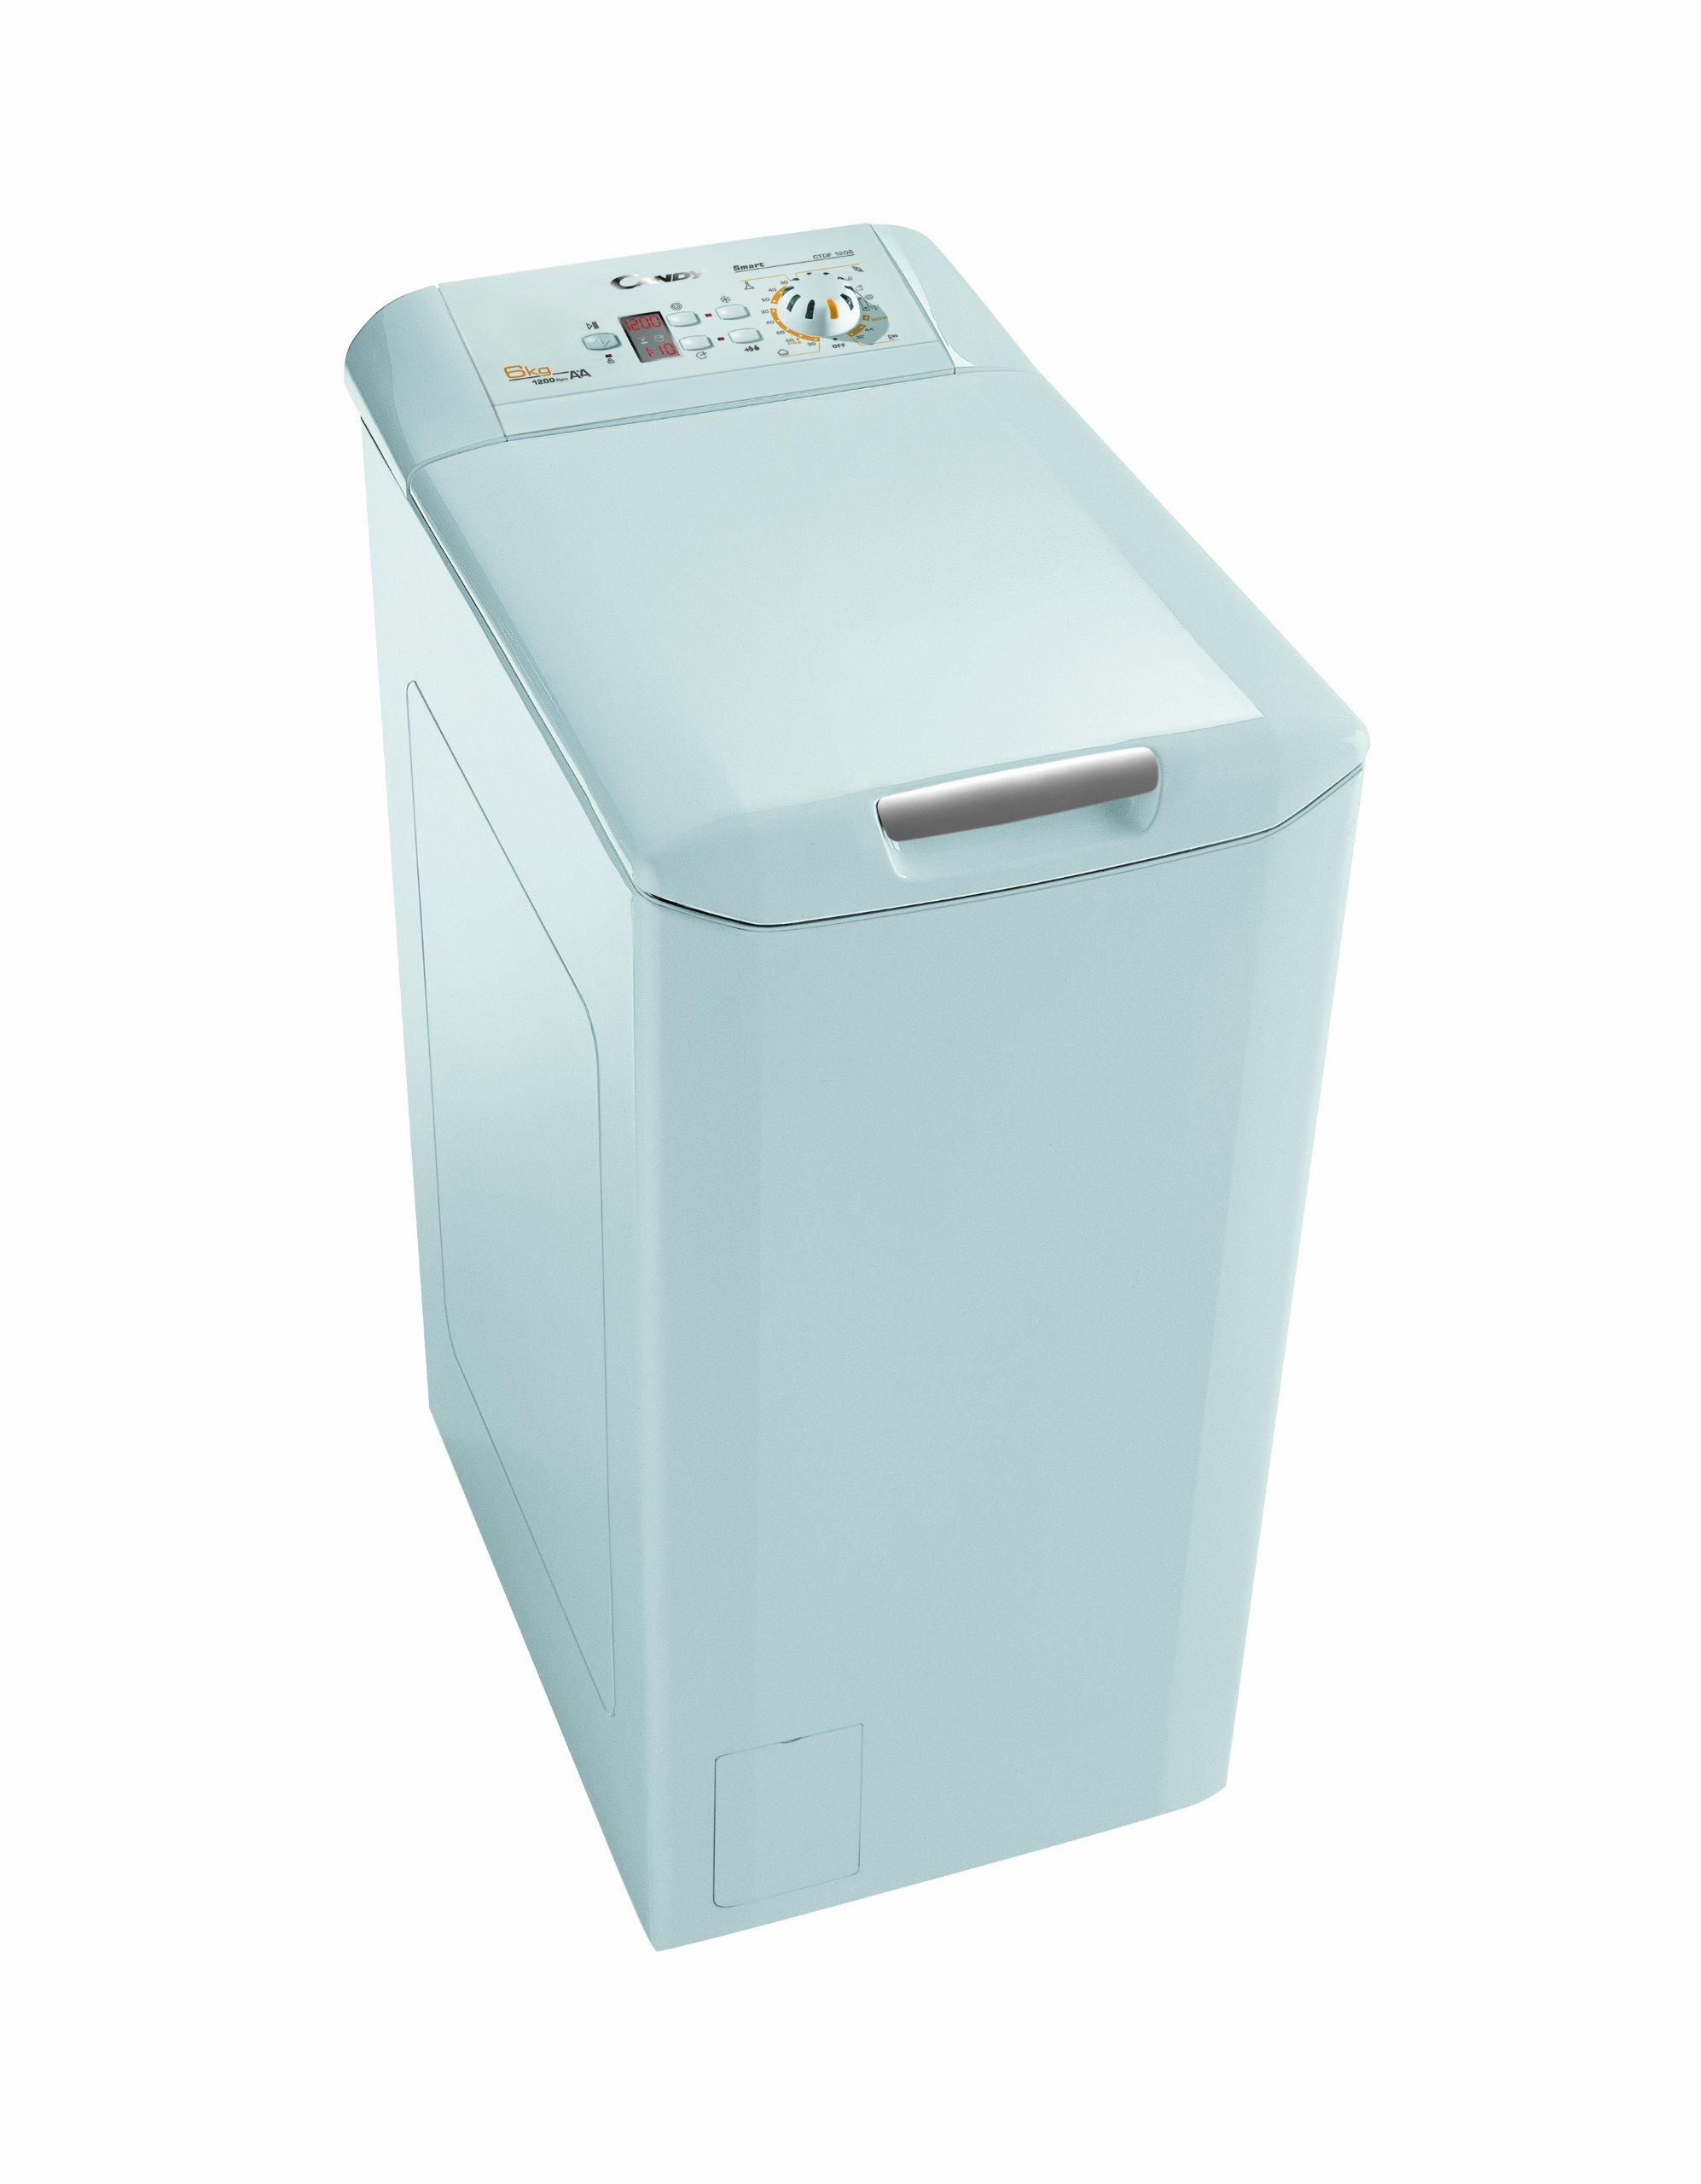 Candy-Activa-Smart-CTDF-1206-Waschmaschinen-Toplader-AAB-1200-Upm-6-kg